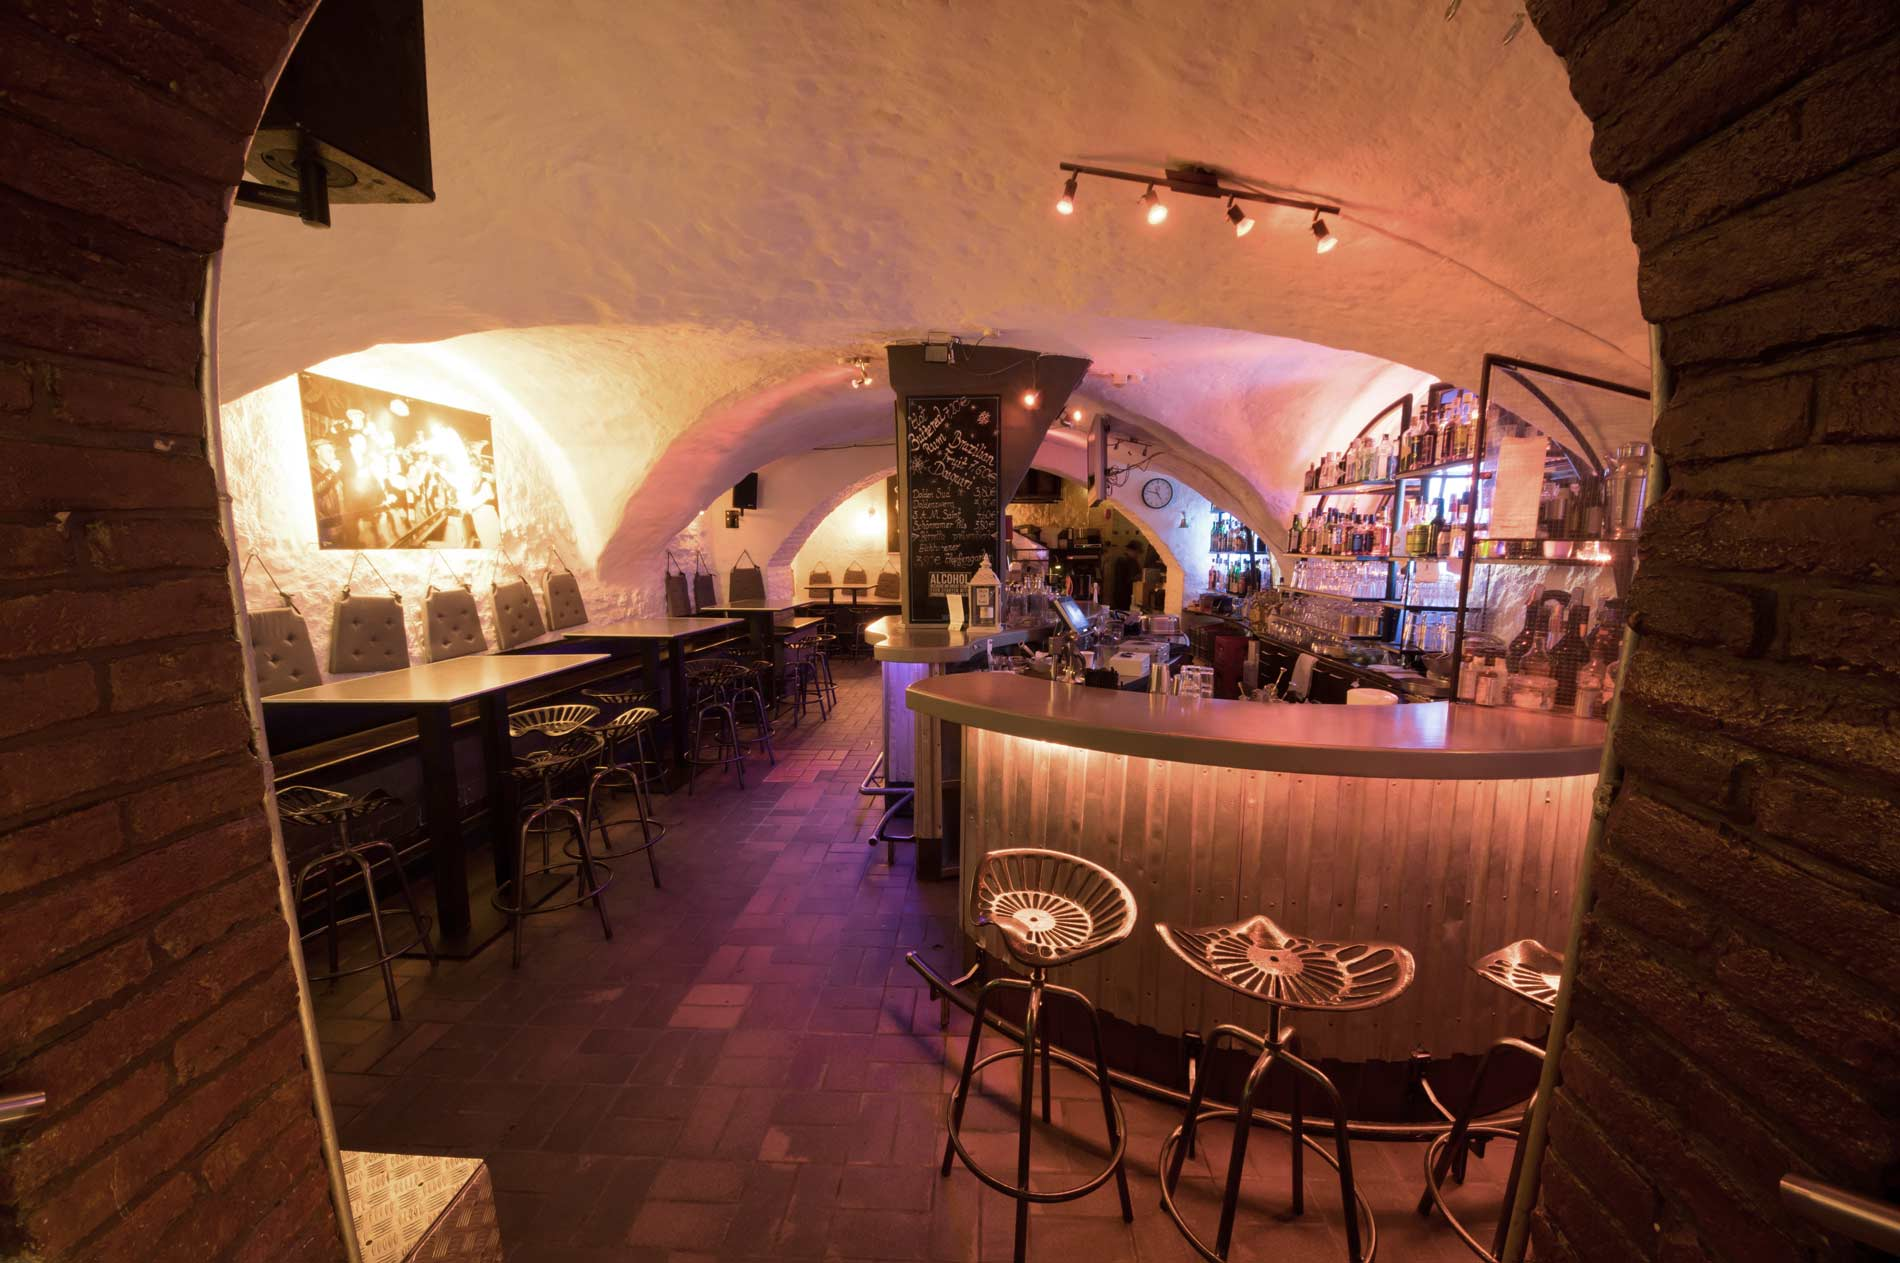 Wunderbar Regensburg   Mixology Bar Guide